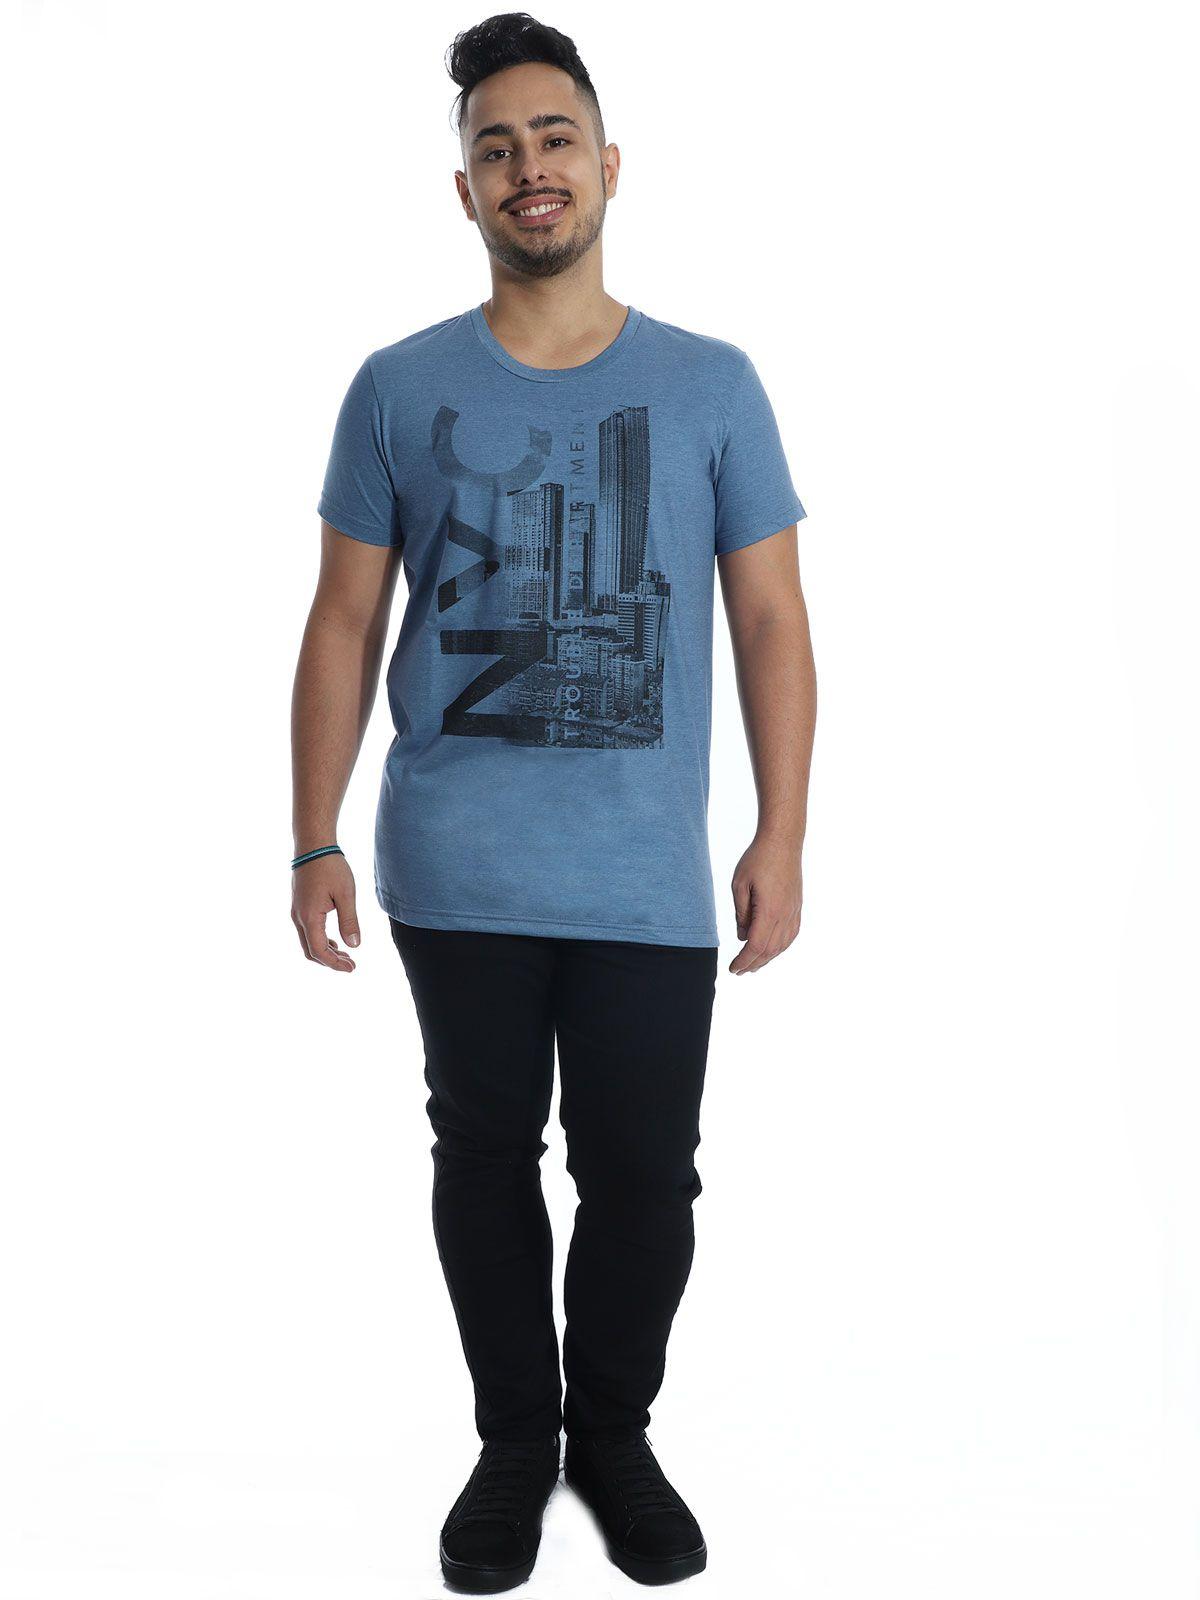 Camiseta Anistia Básica Stoned Jeans